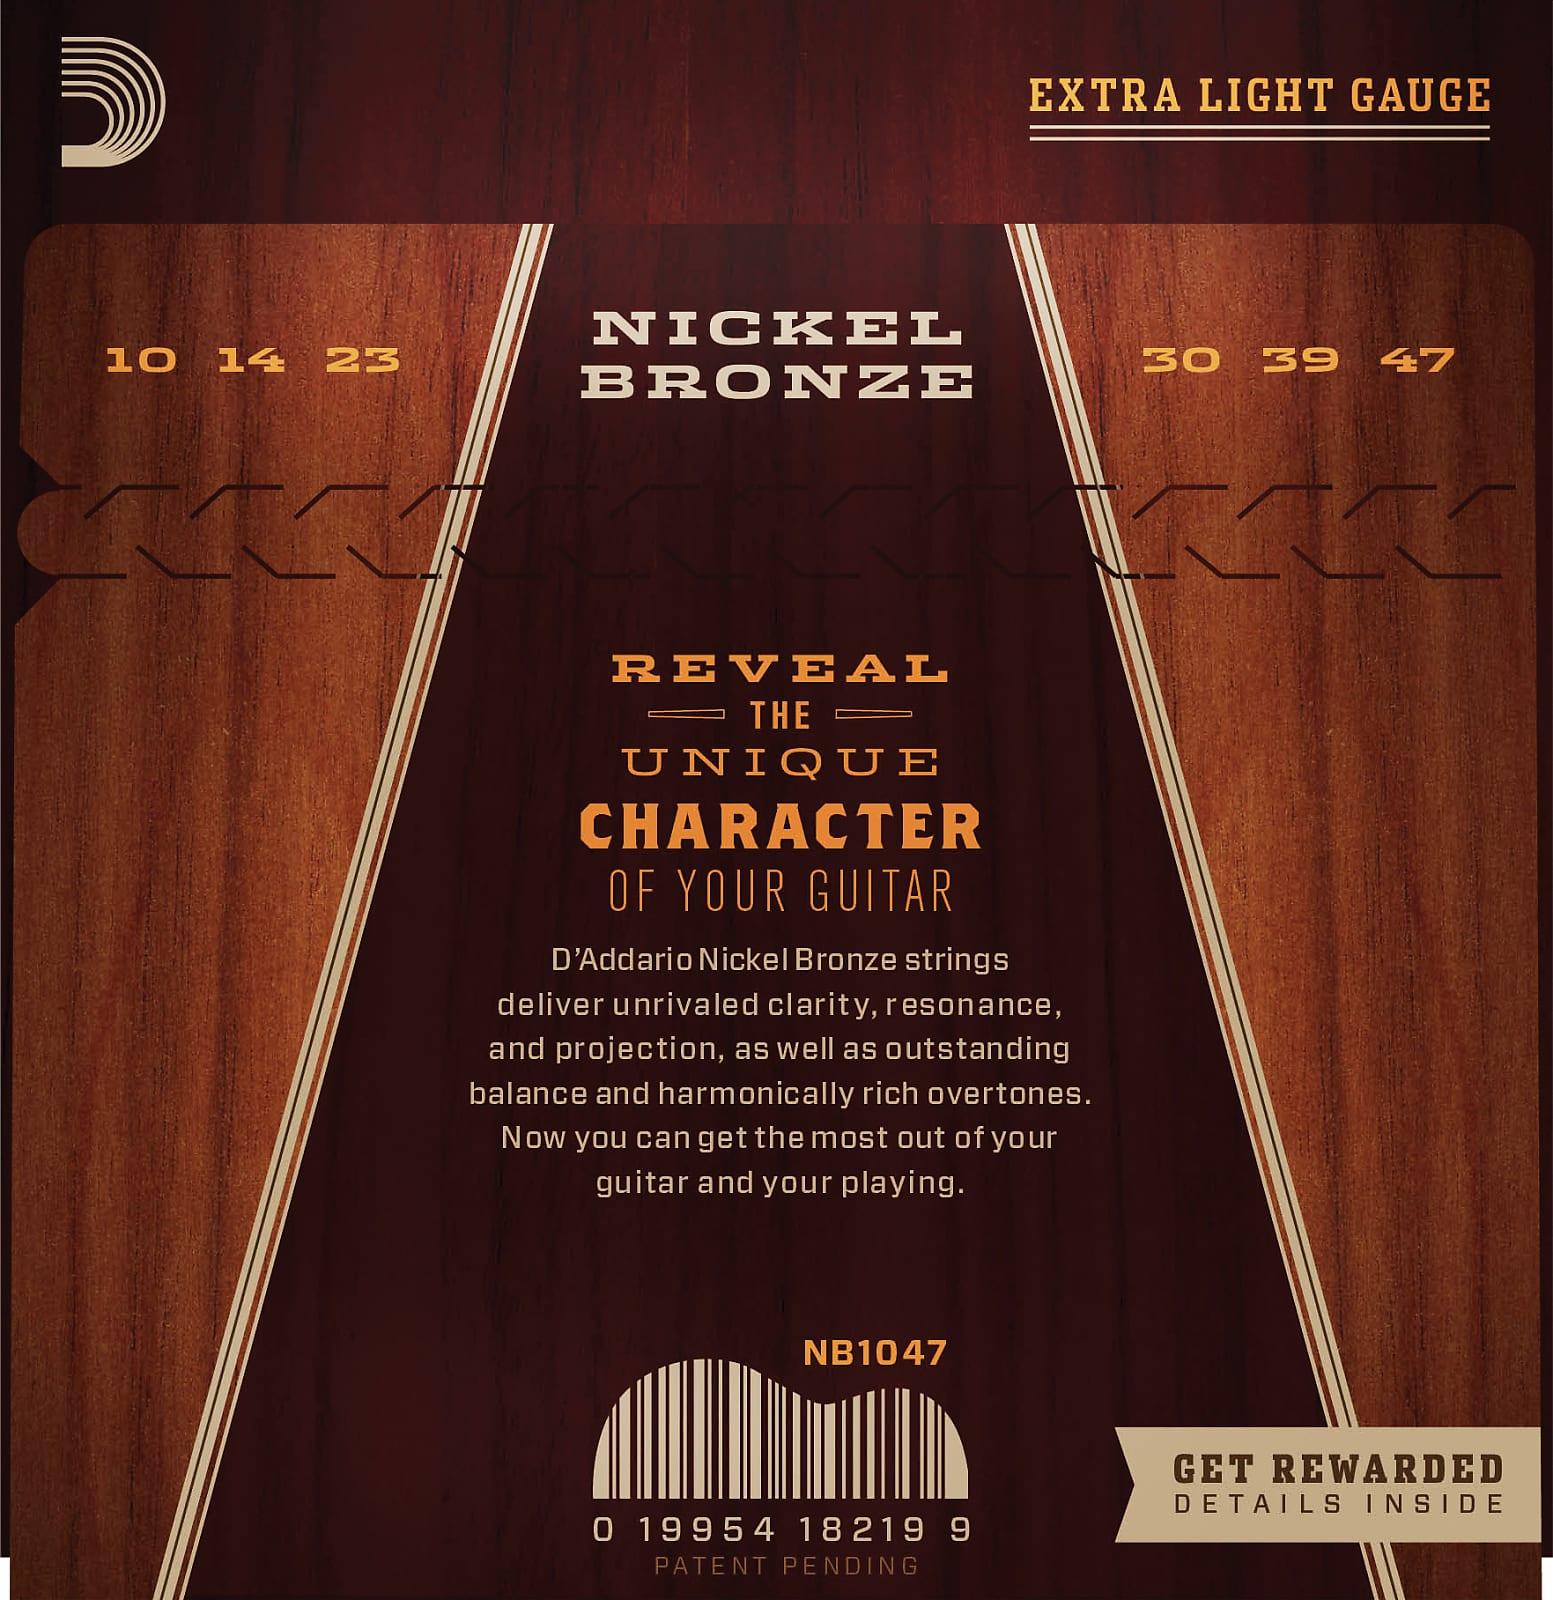 D'Addario NB1047 Nickel Bronze Acoustic Guitar Strings, Extra Light, 10-47